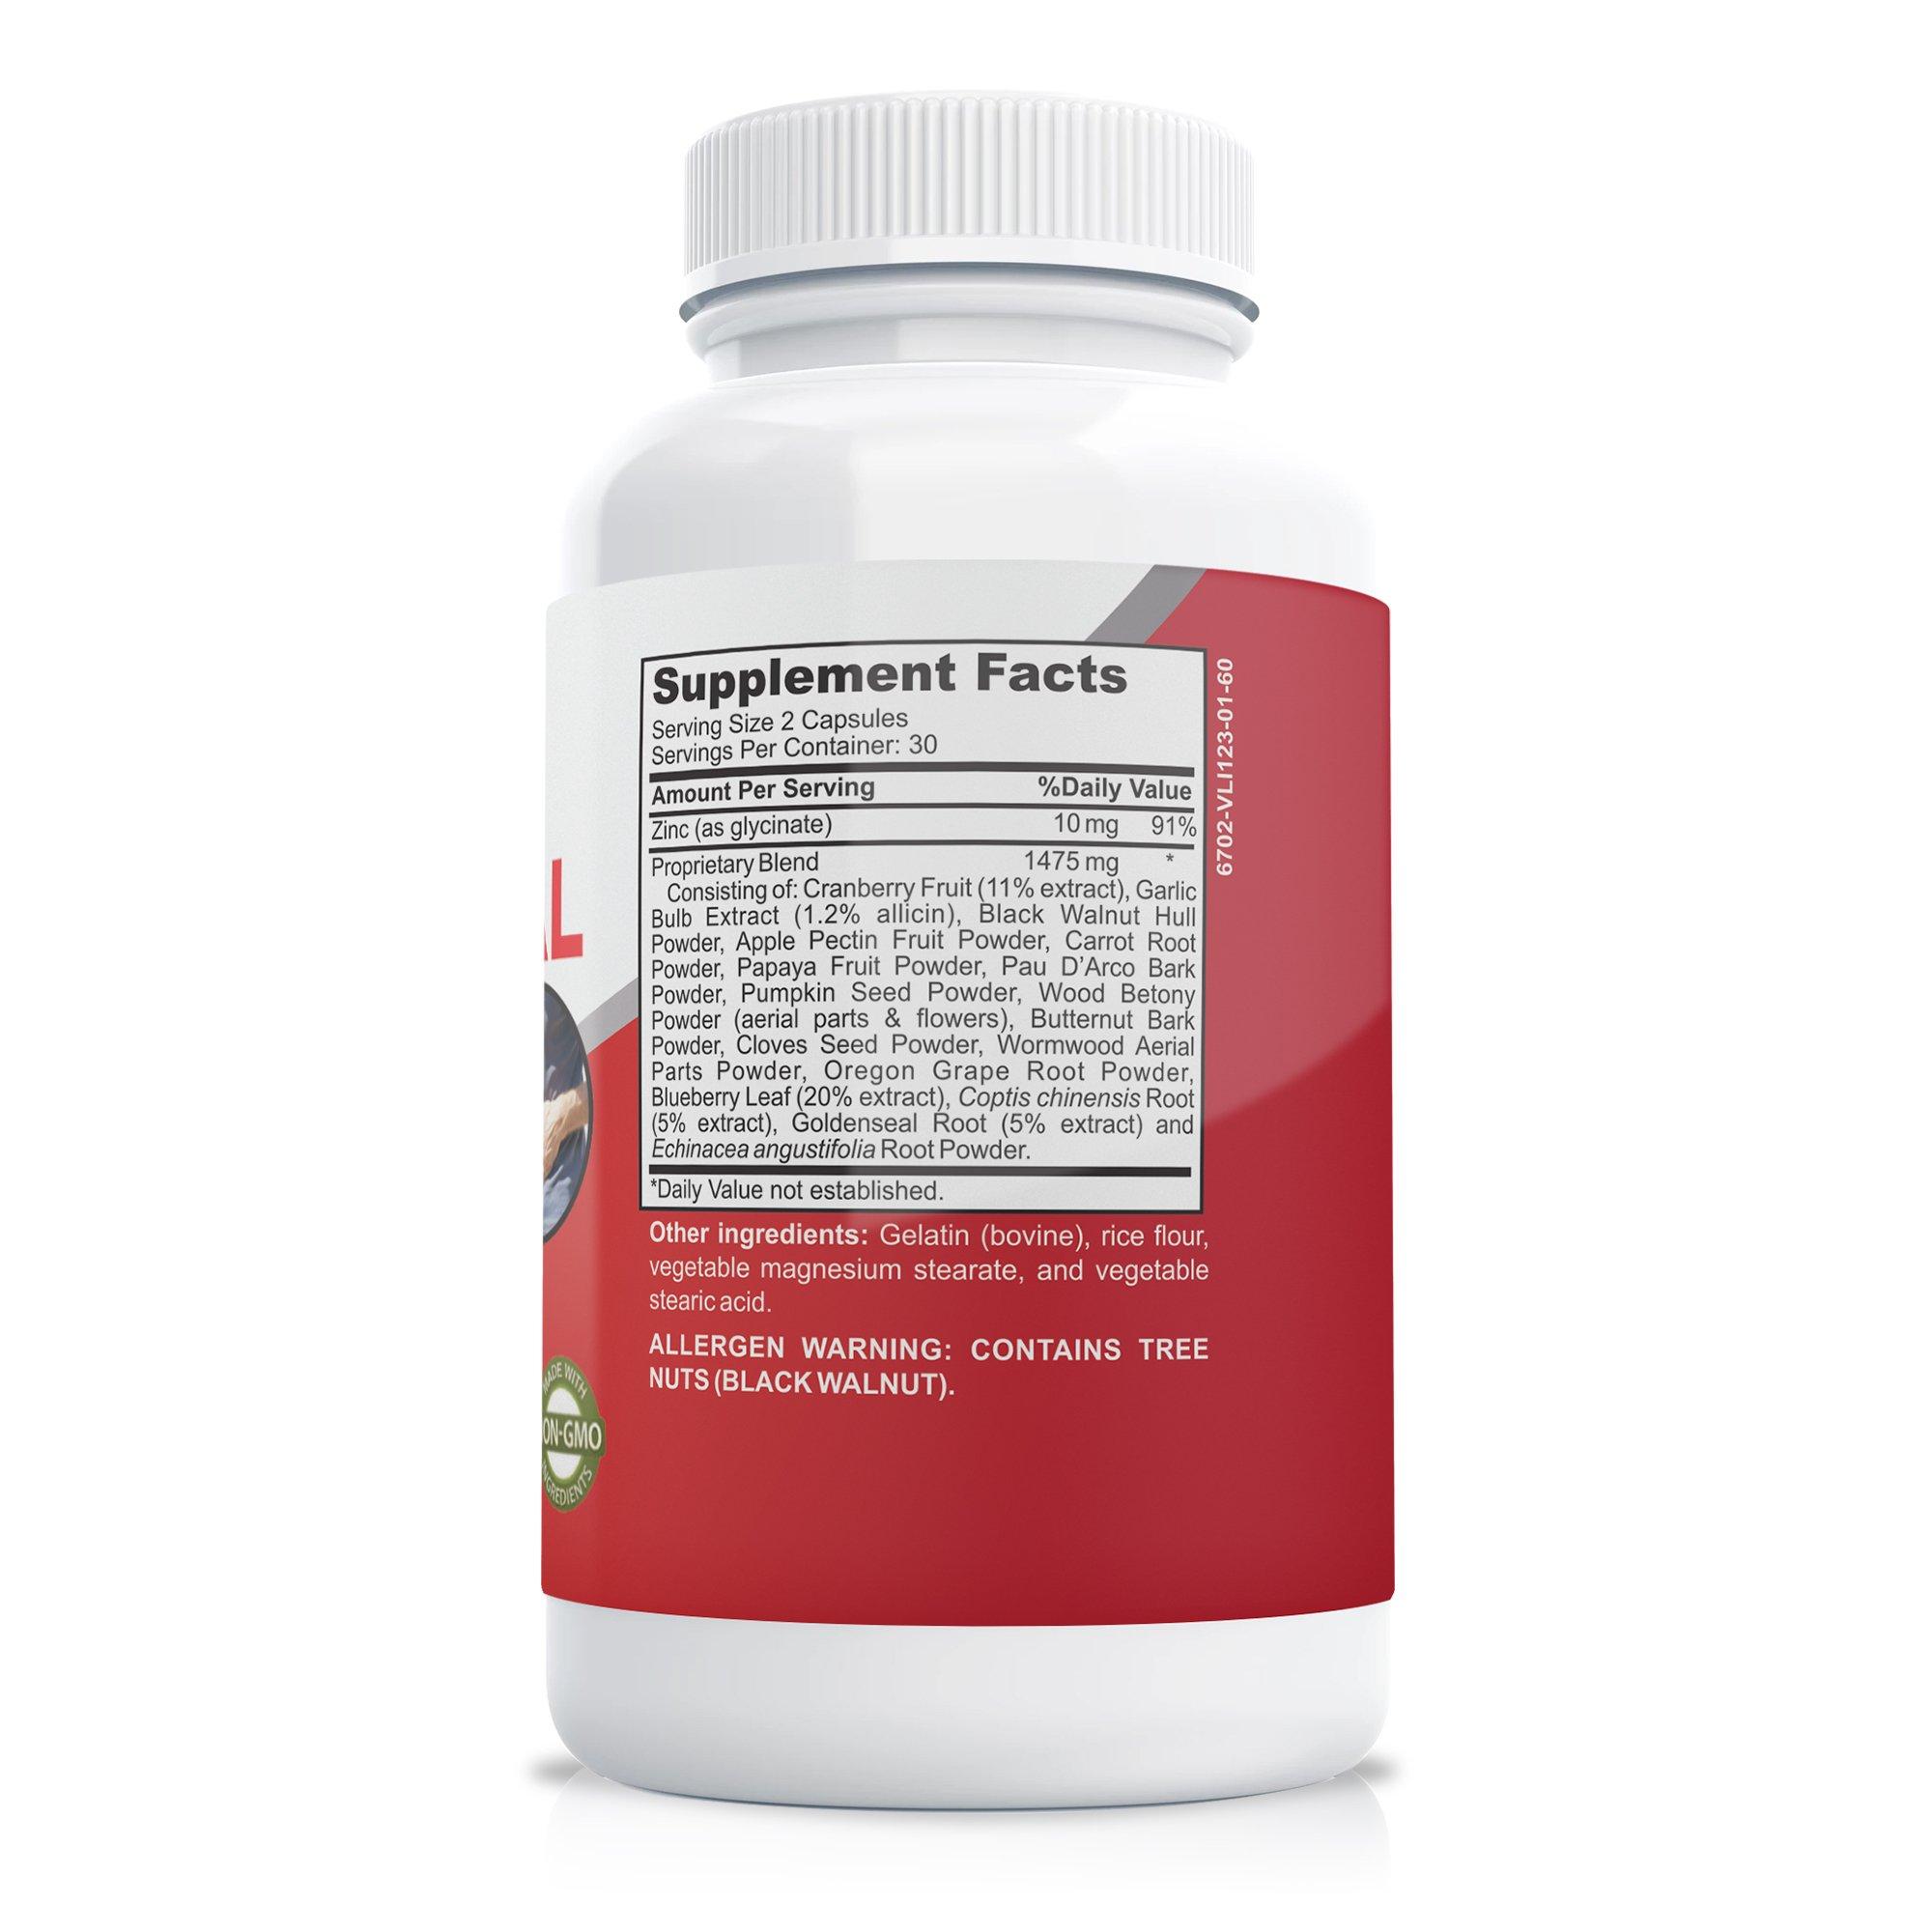 Intestinal Support 1475 mg + Zinc - 60 Caps (Non-GMO)